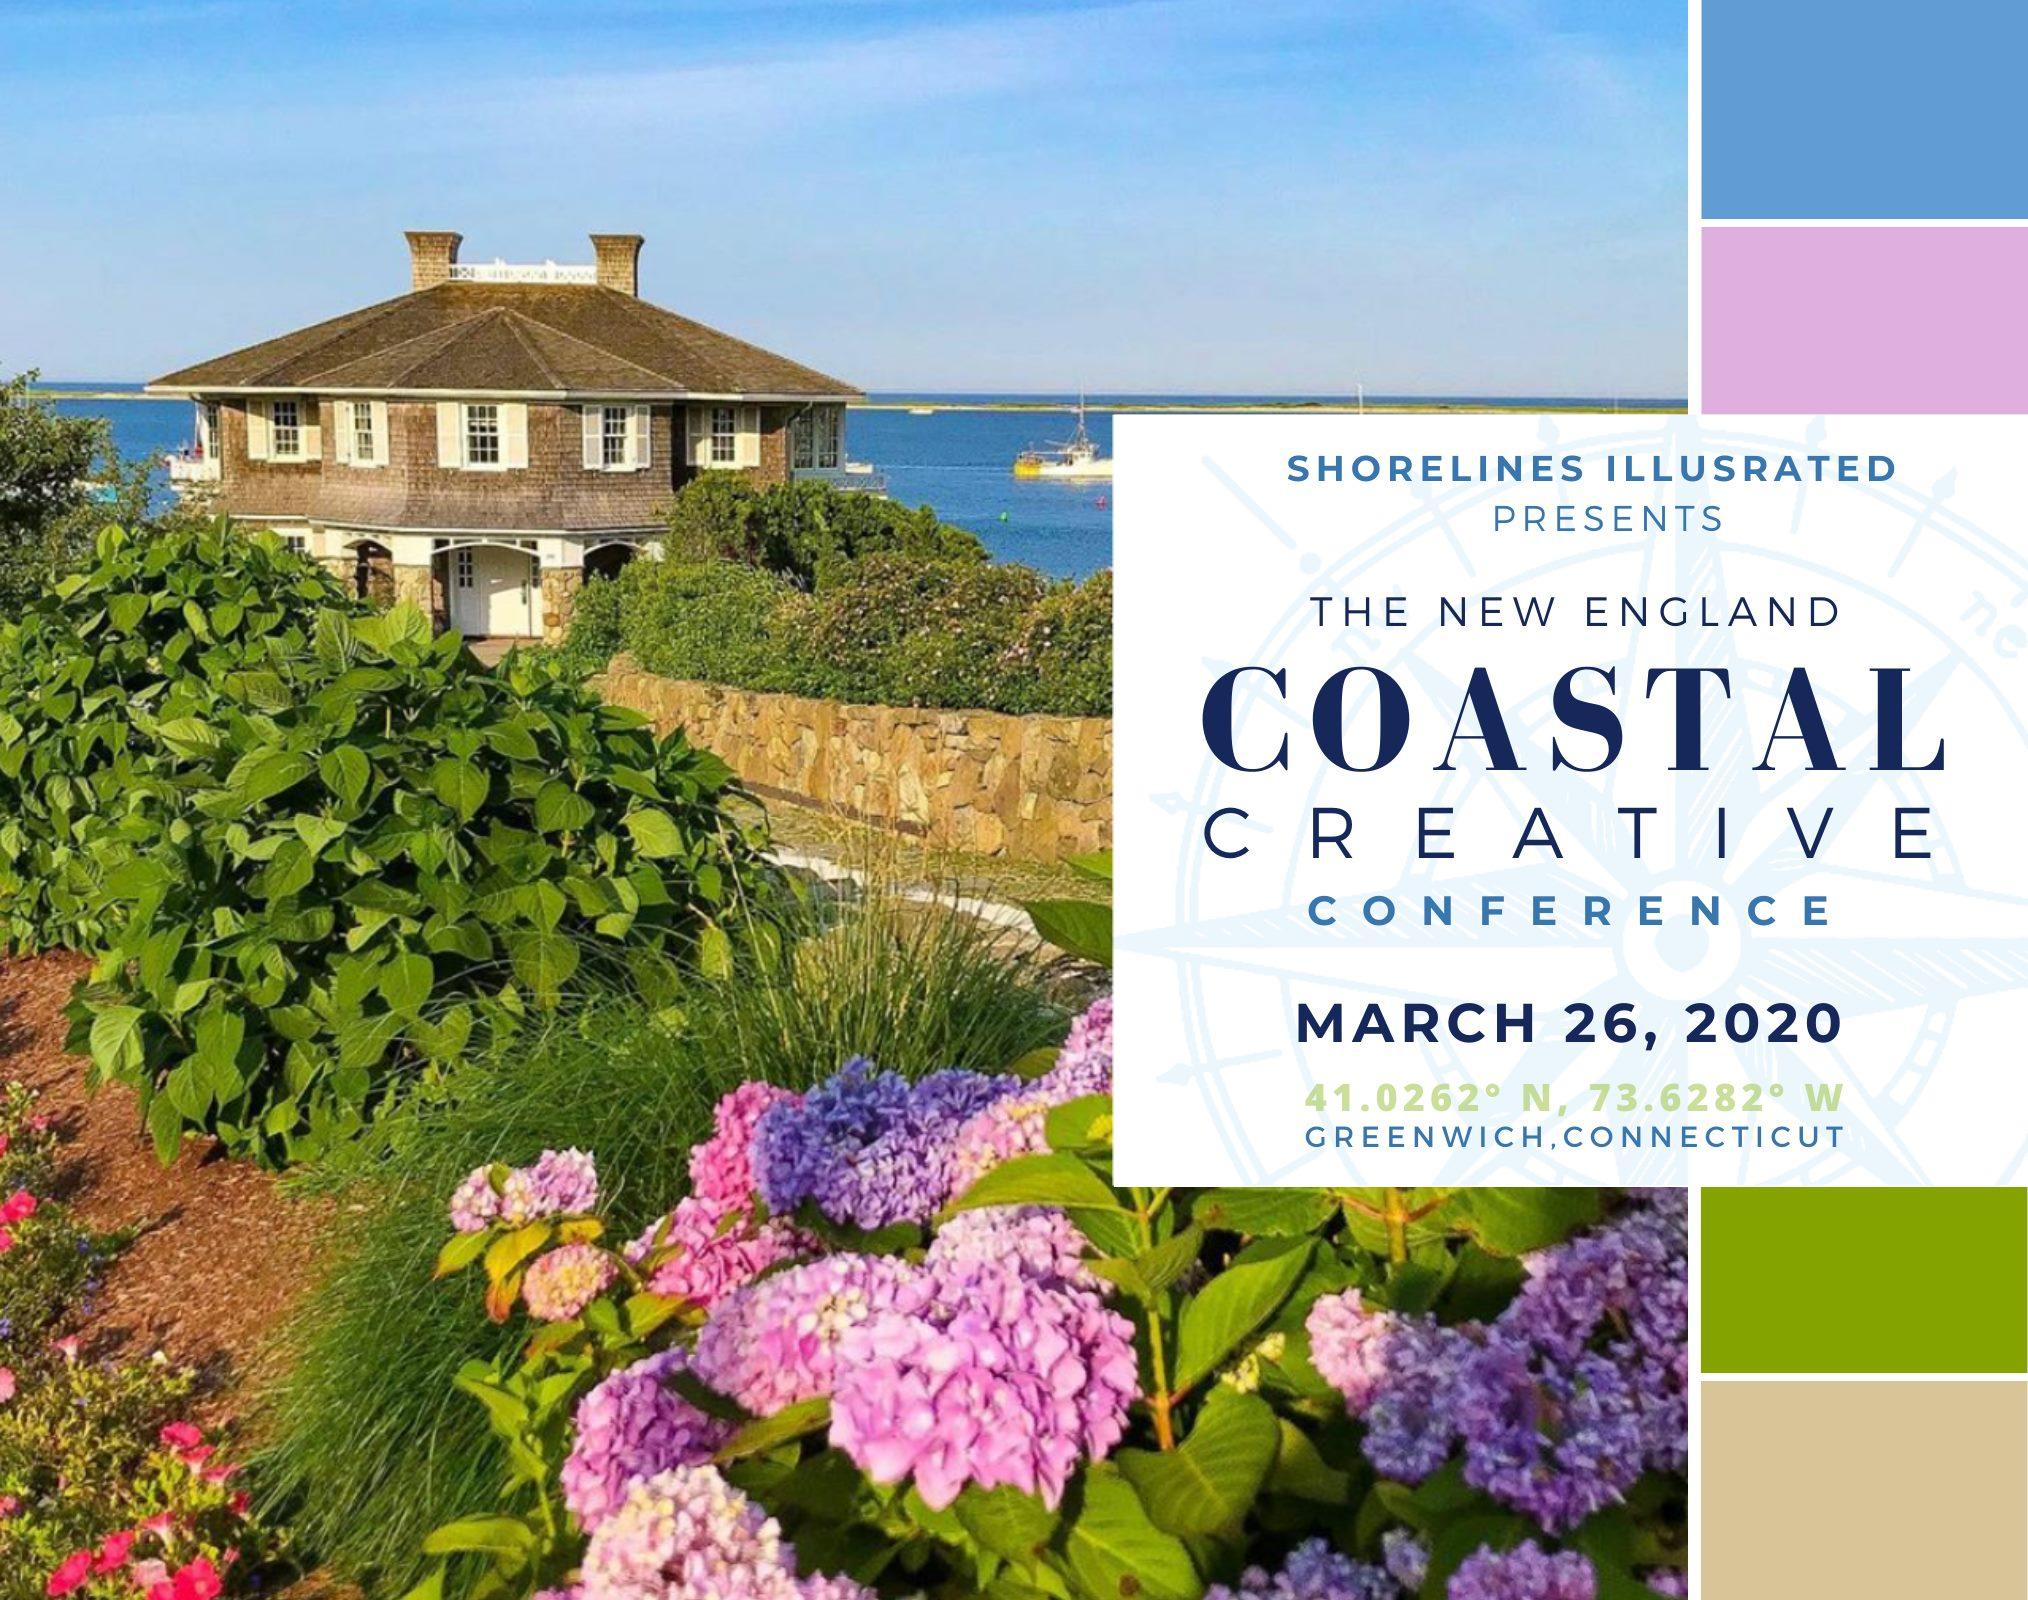 The New England Coastal Creative Conference